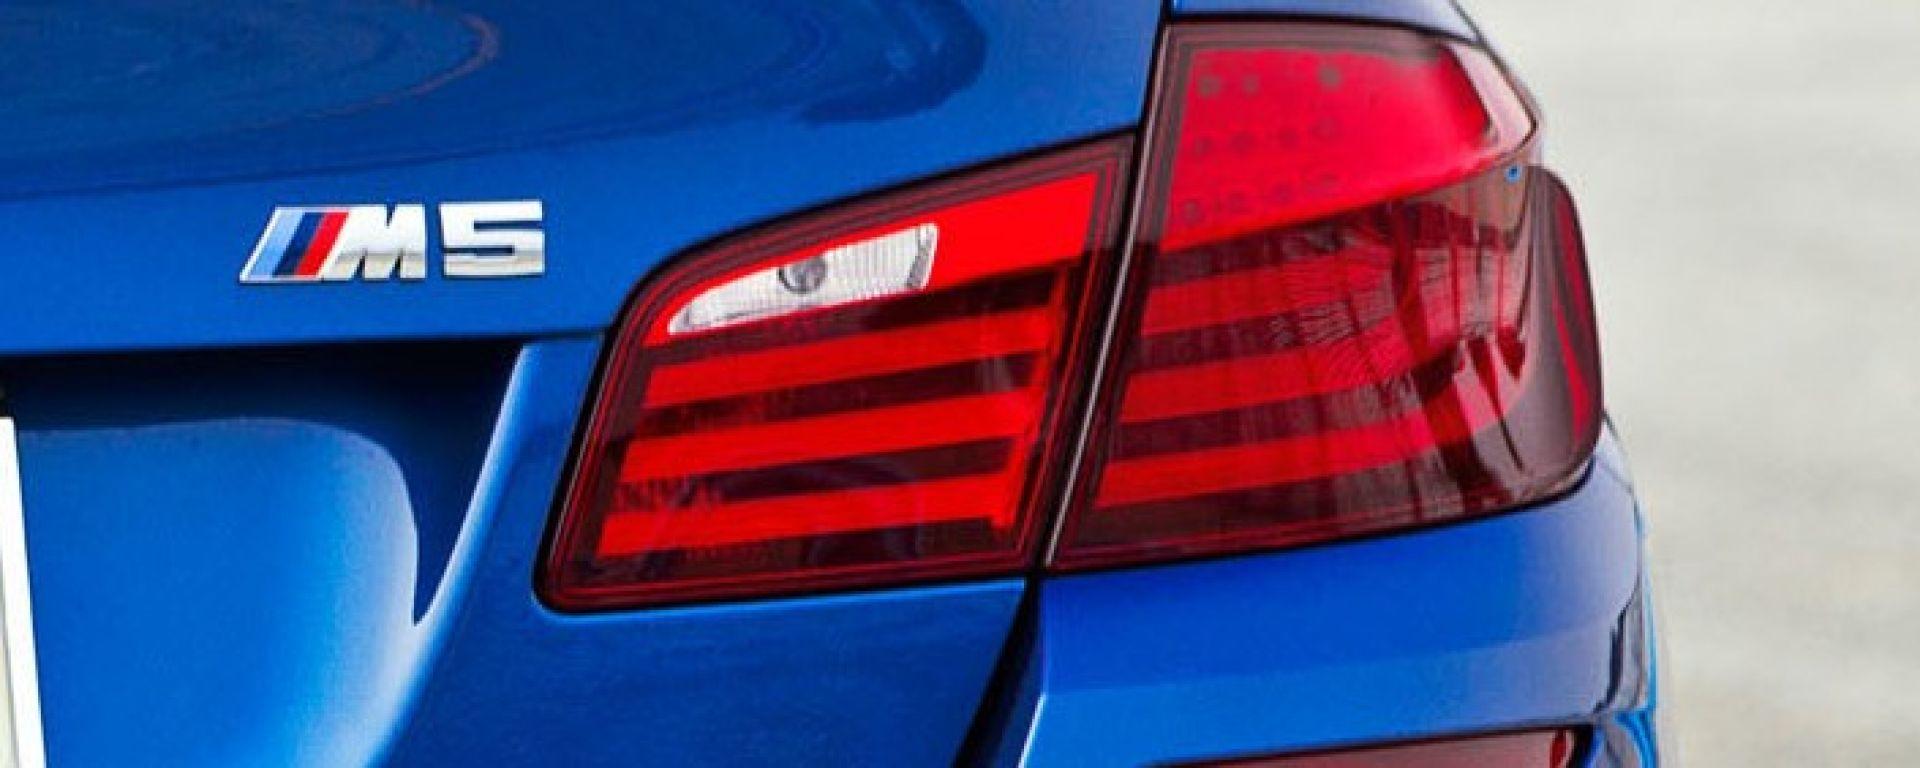 BMW M5: la prossima generazione sarà a trazione integrale